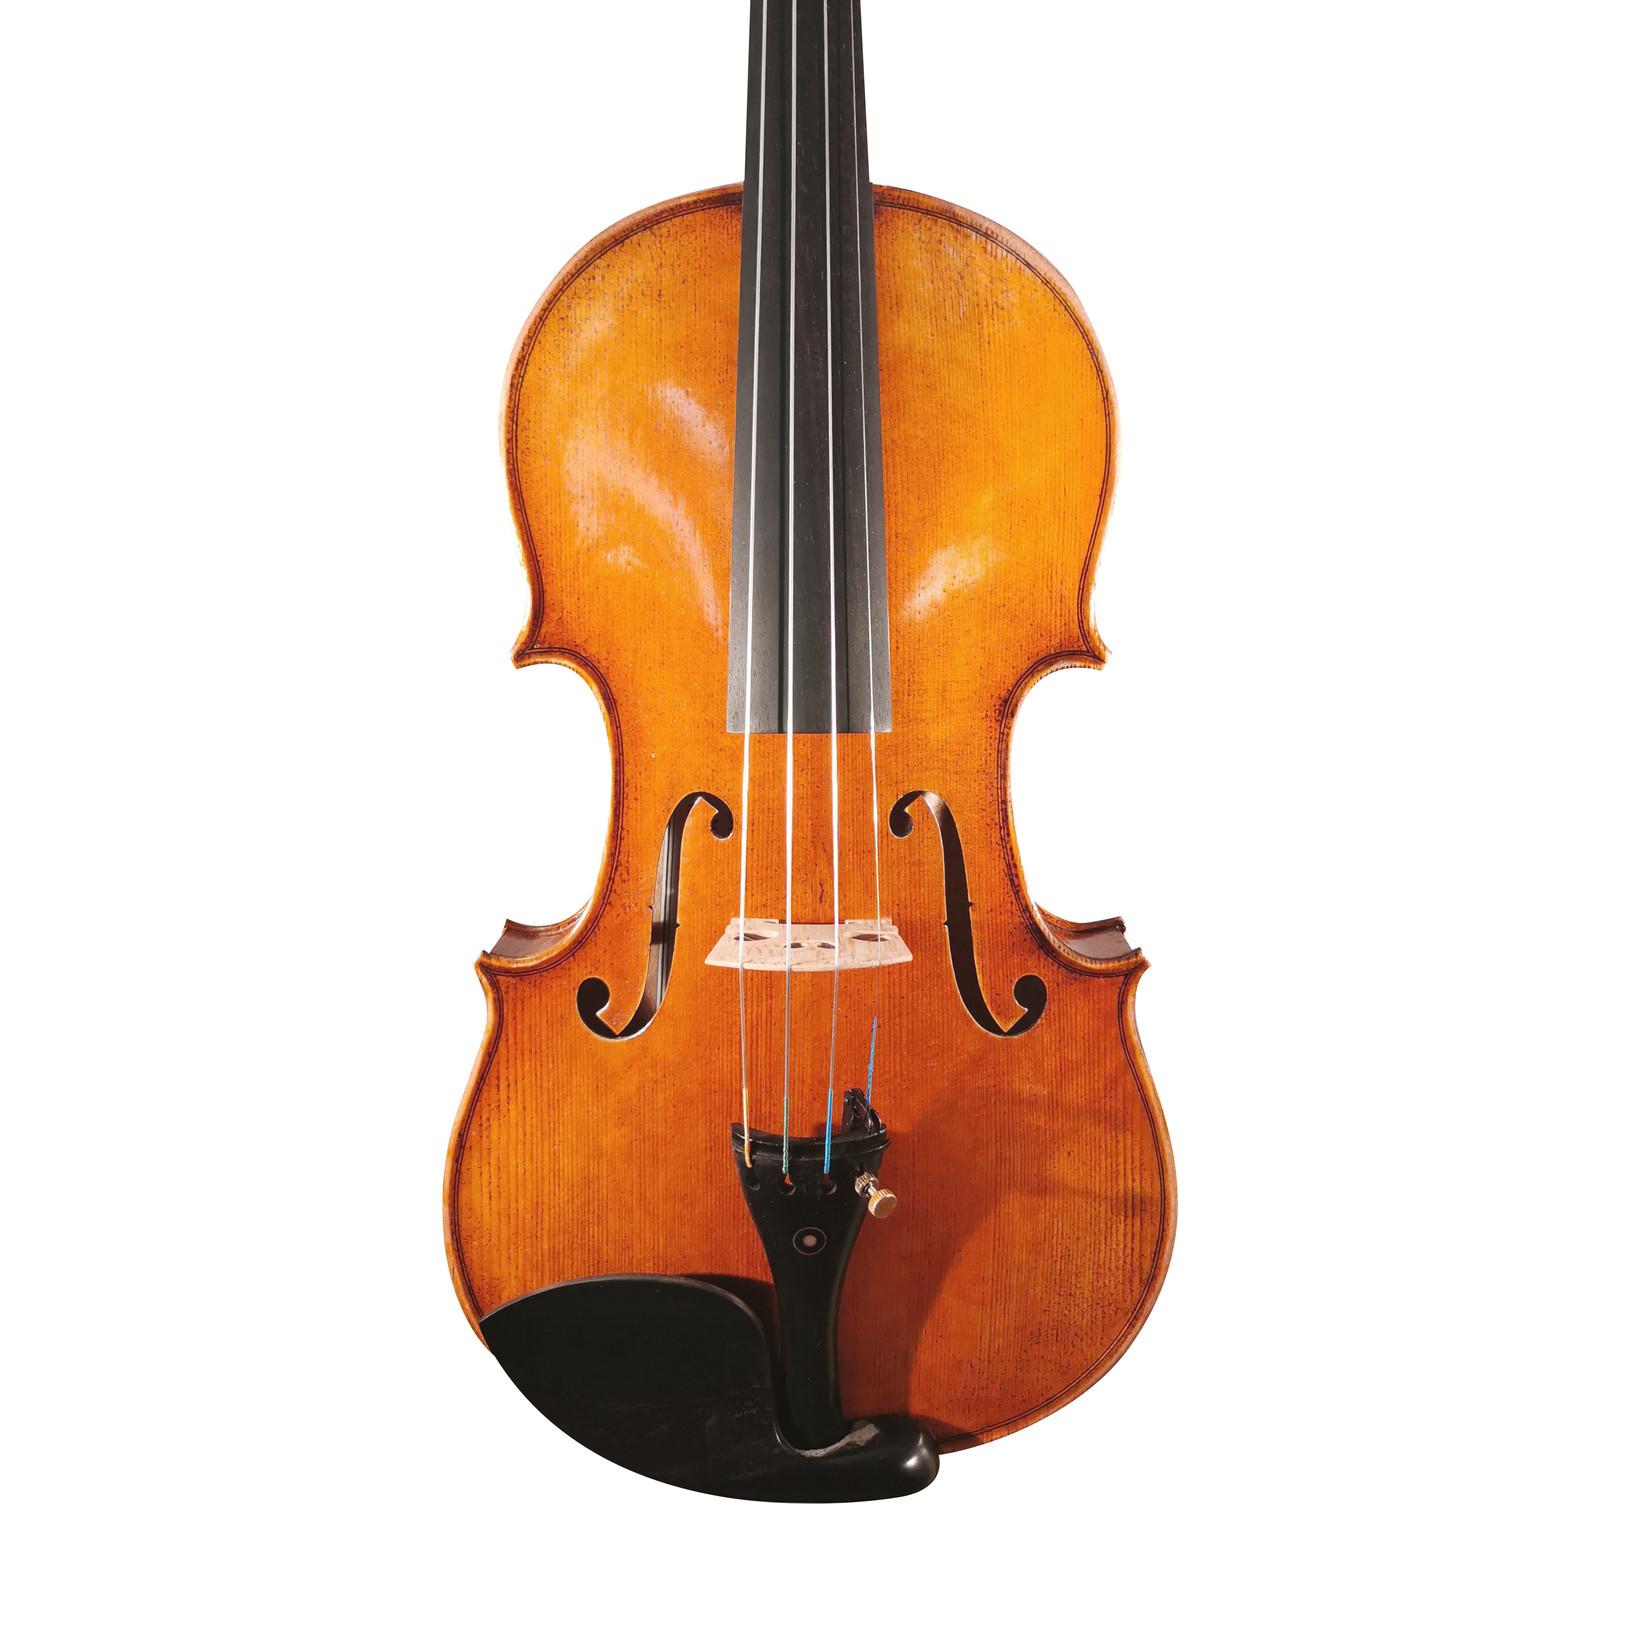 Violon Domenico Stefani Strad 500 4/4 (seul)